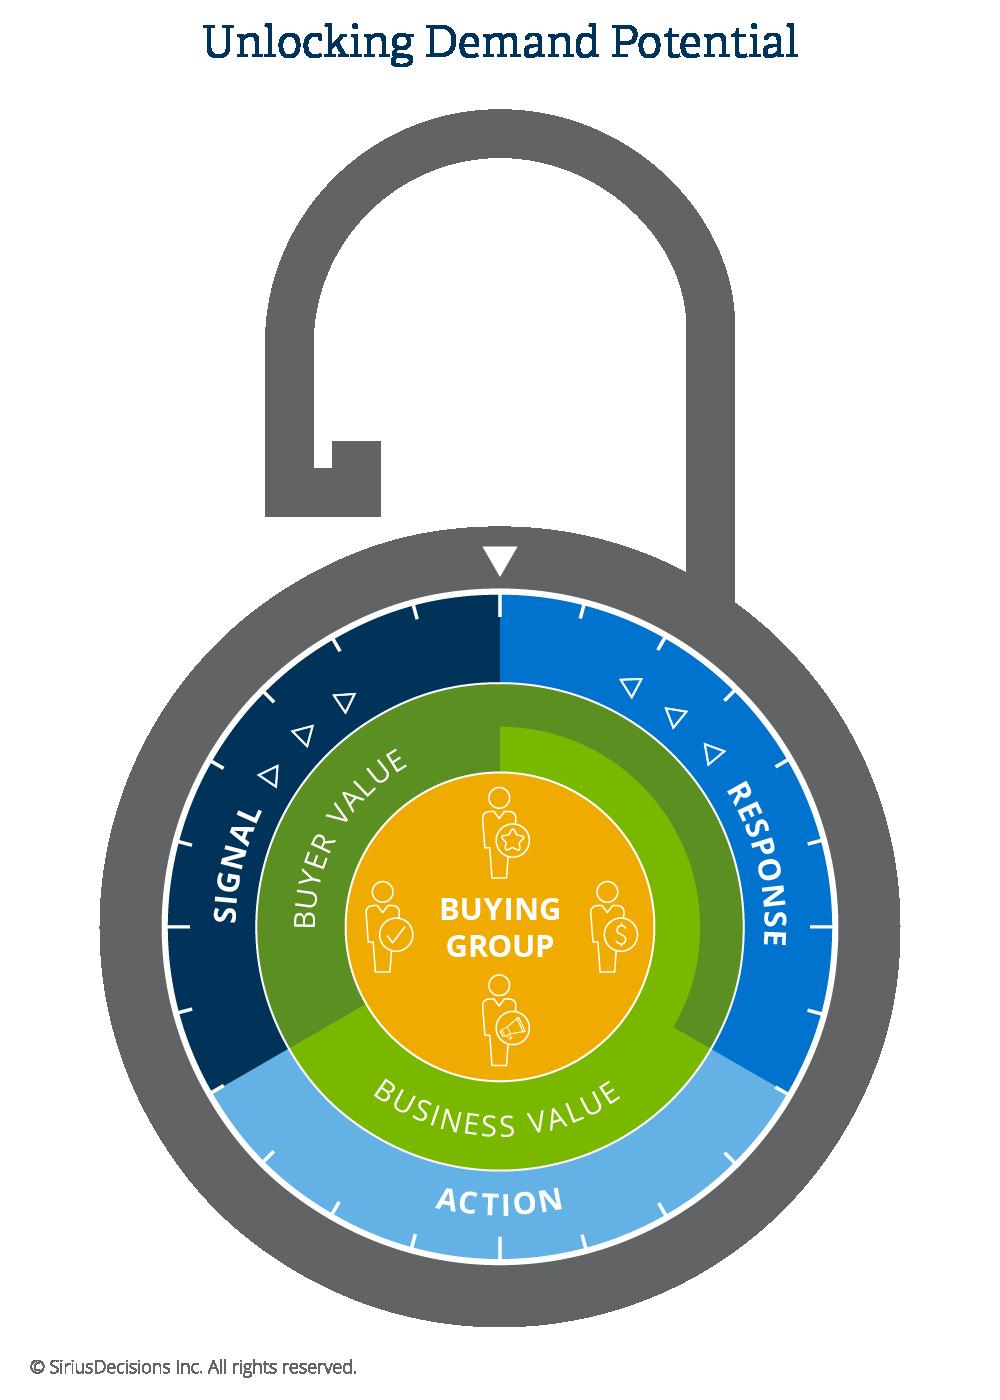 EMEA Unlocking Demand Potential Campaign Visual